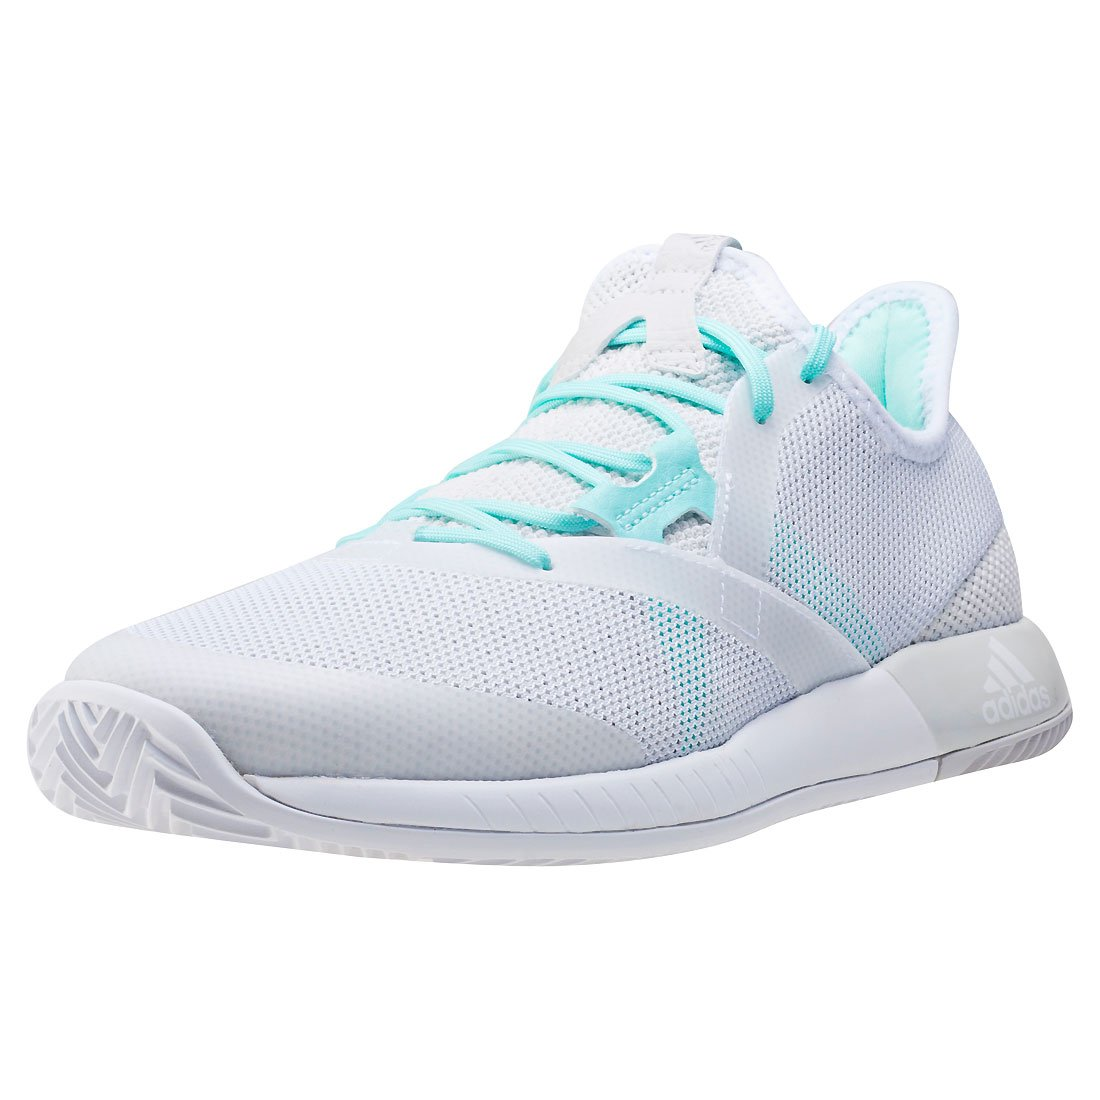 MultiCouleure (Ftwbla   Ftwbla   Griuno) adidas Adizero Defiant Bounce W, Chaussures de Tennis Femme 42 EU